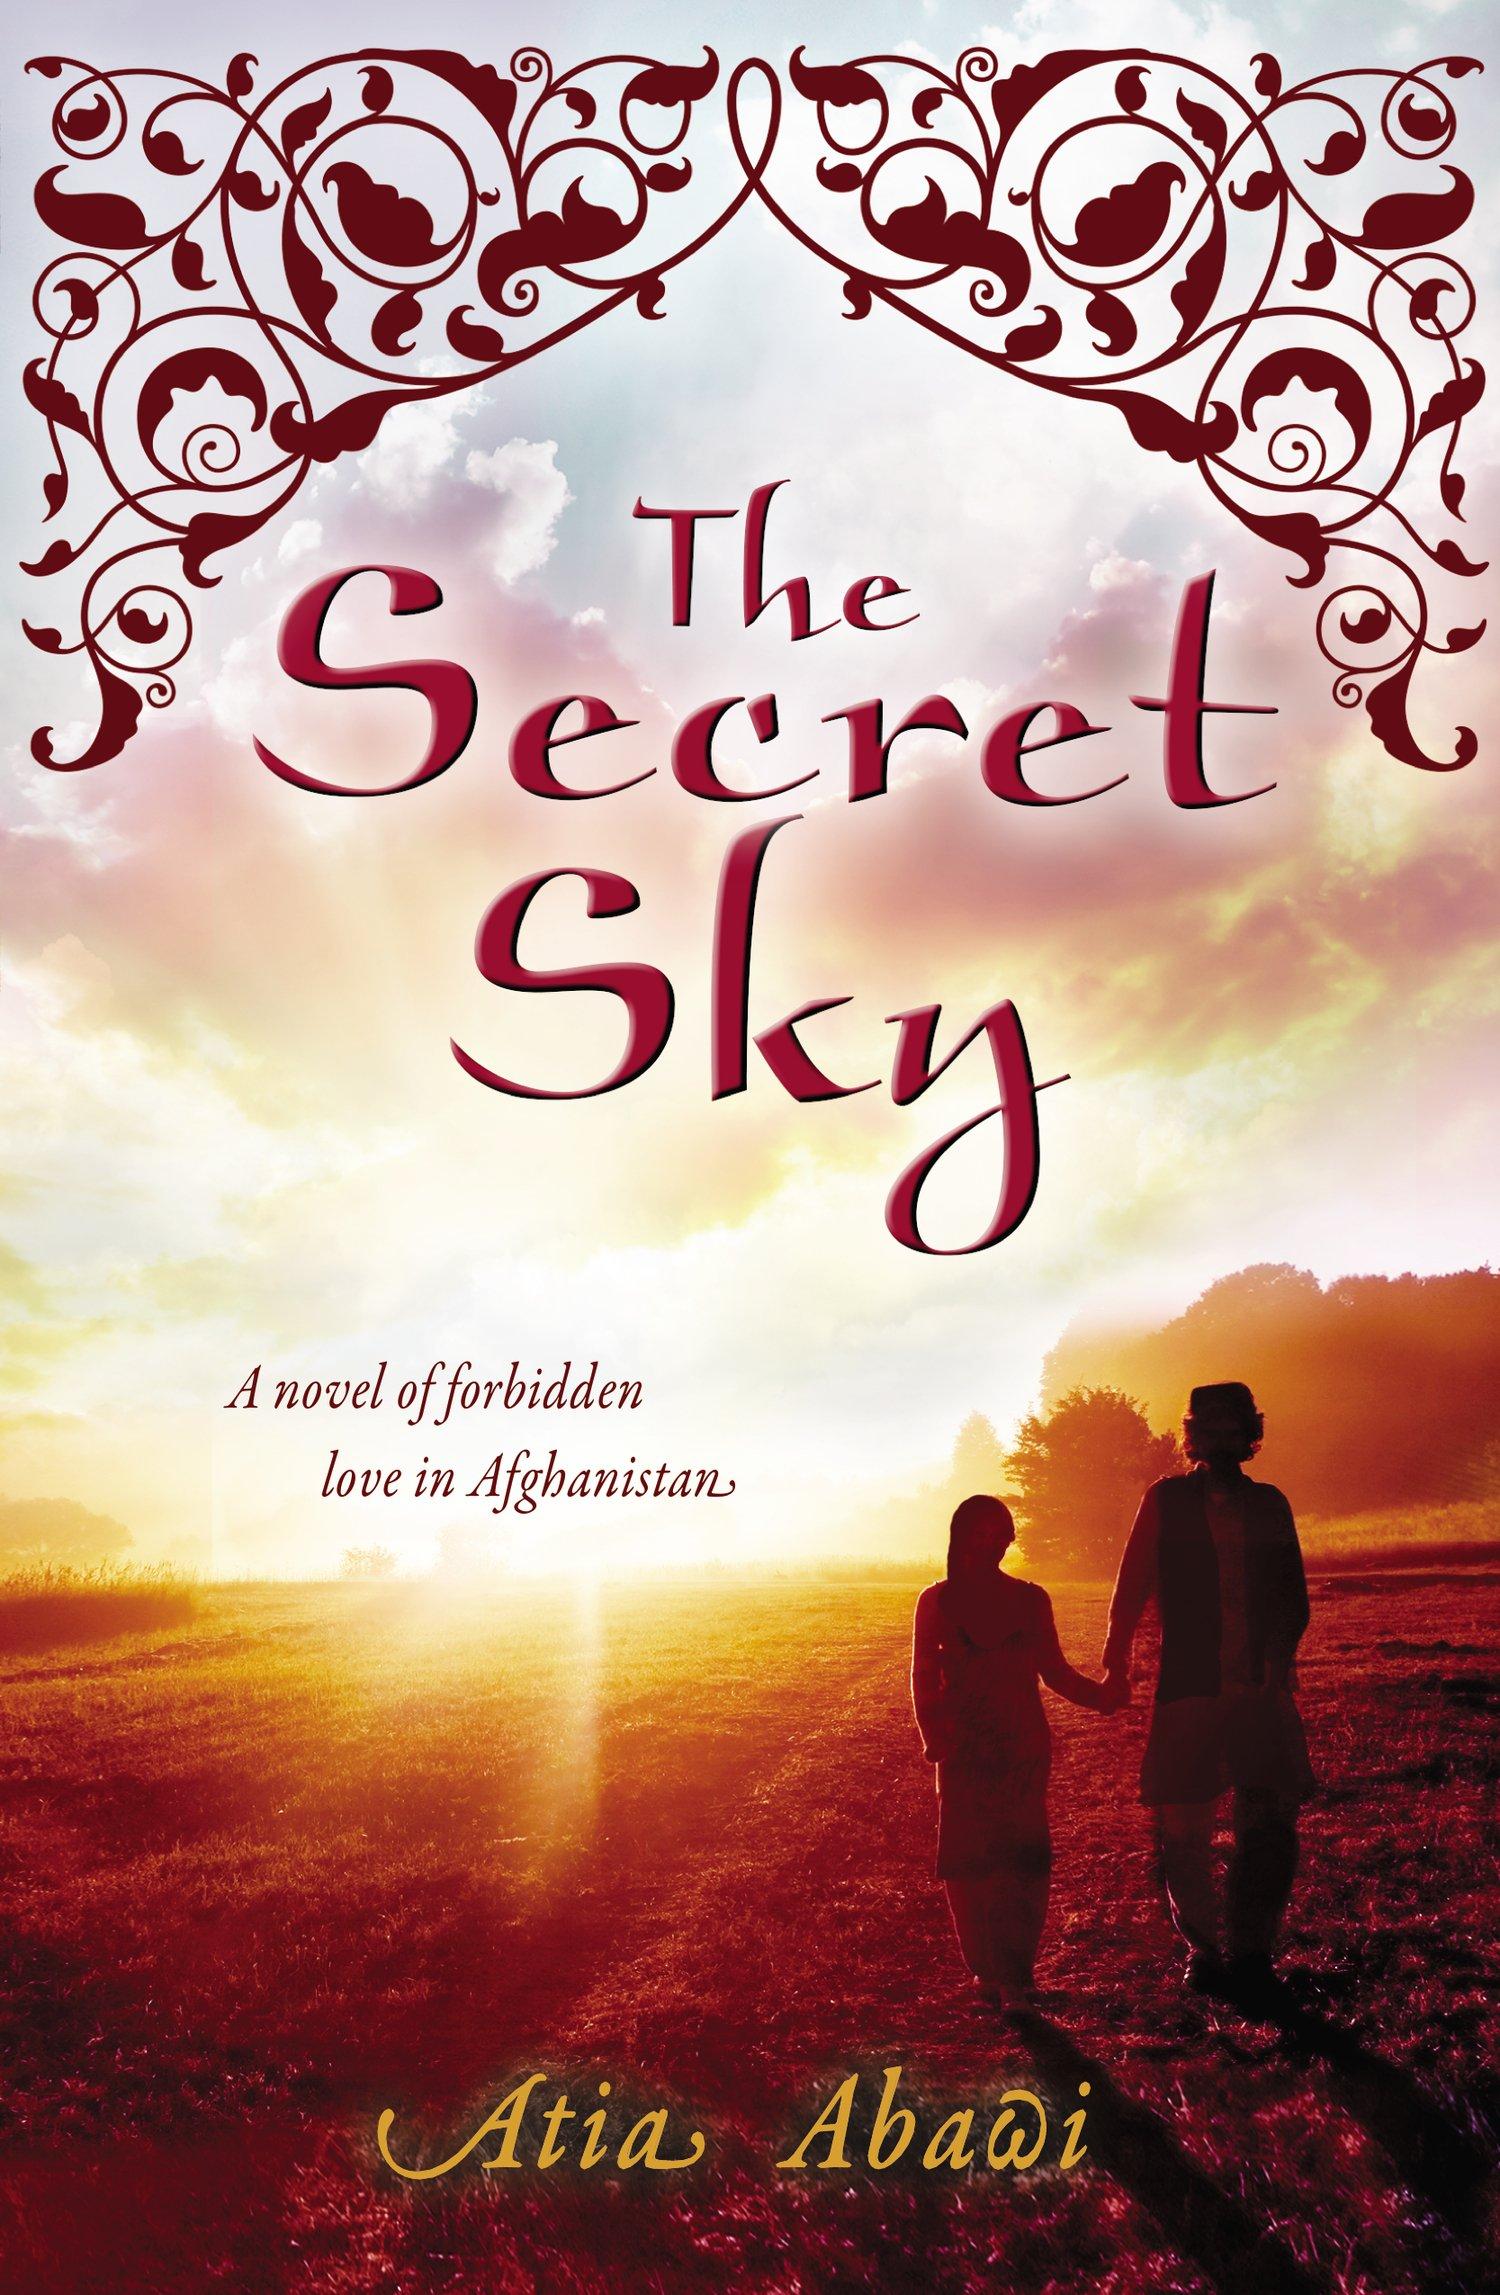 The Secret Sky A novel of Forbidden love in Afghanistan